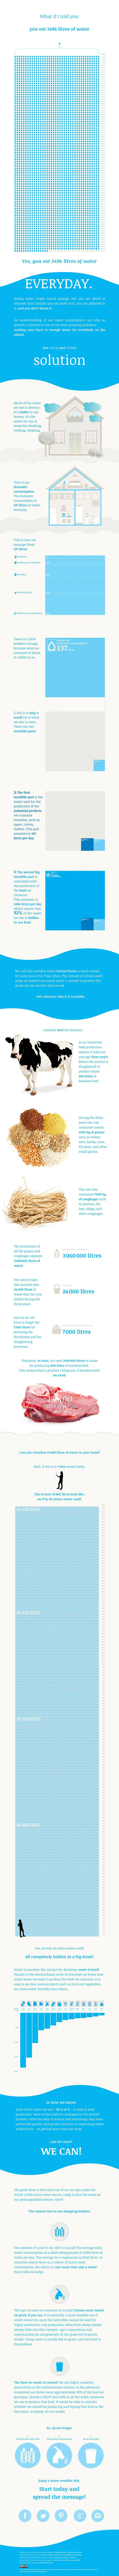 Water we eat